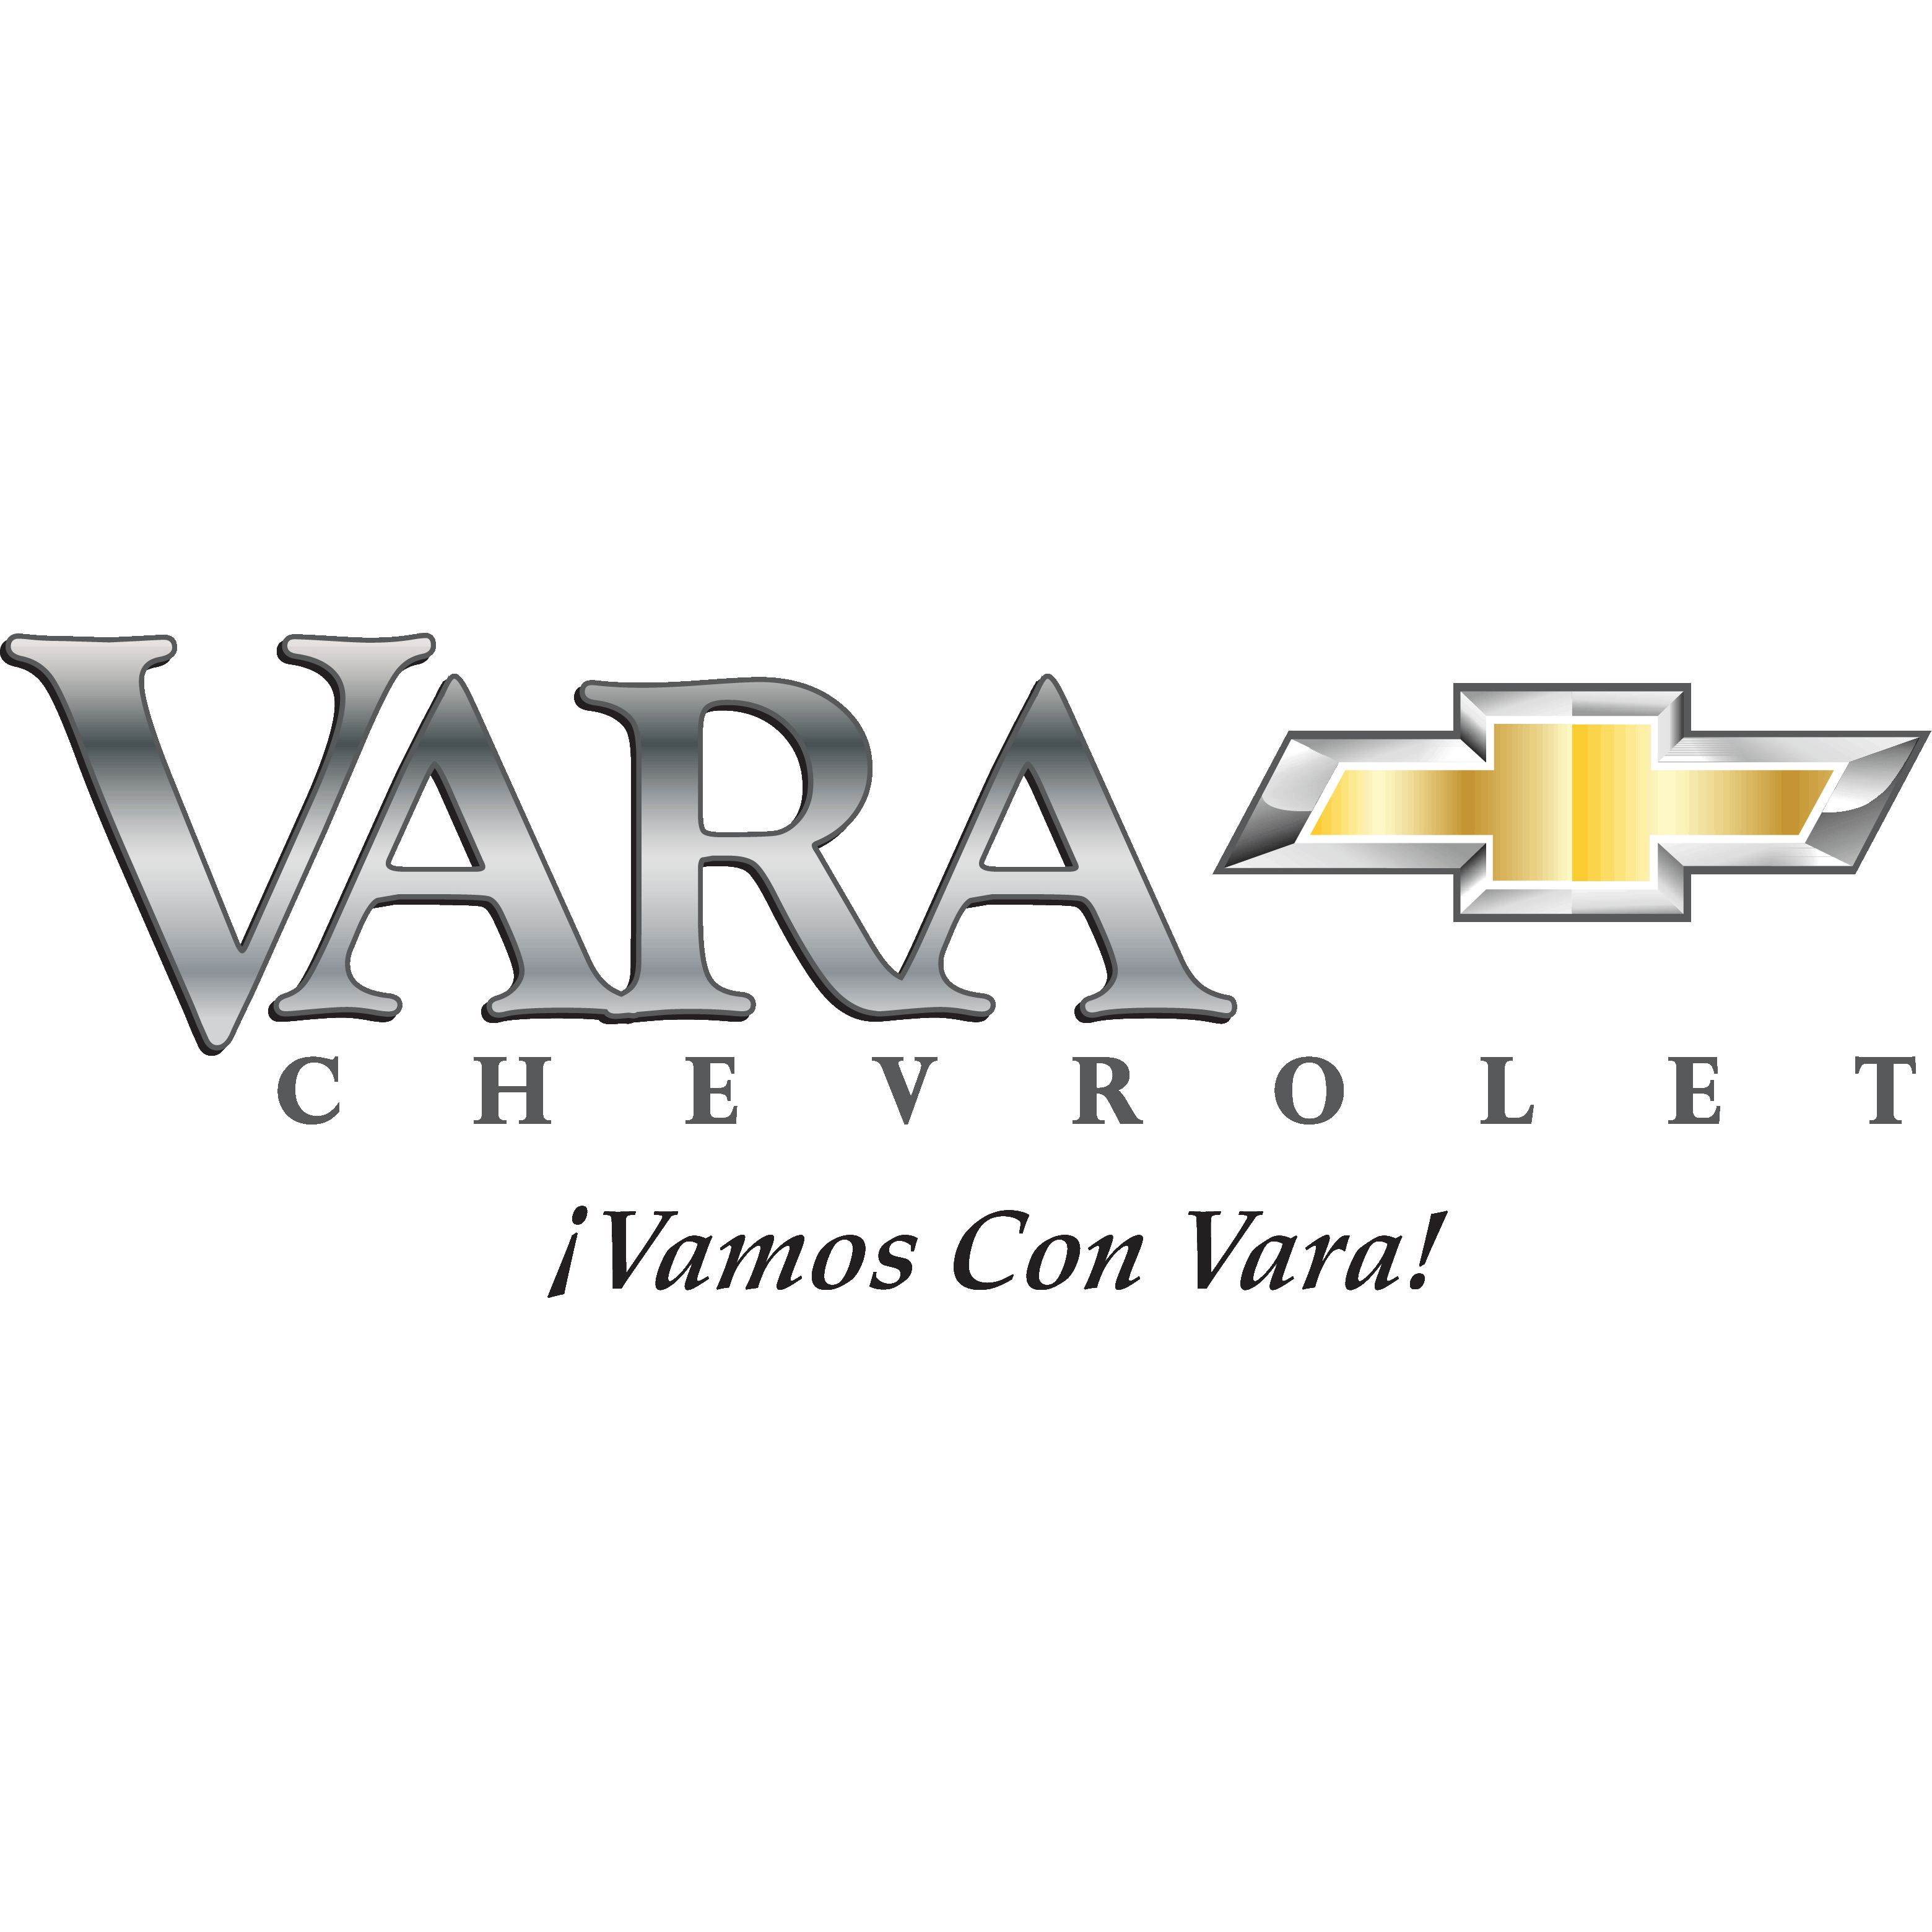 Vara Chevrolet in San Antonio, TX 78224 - ChamberofCommerce.com